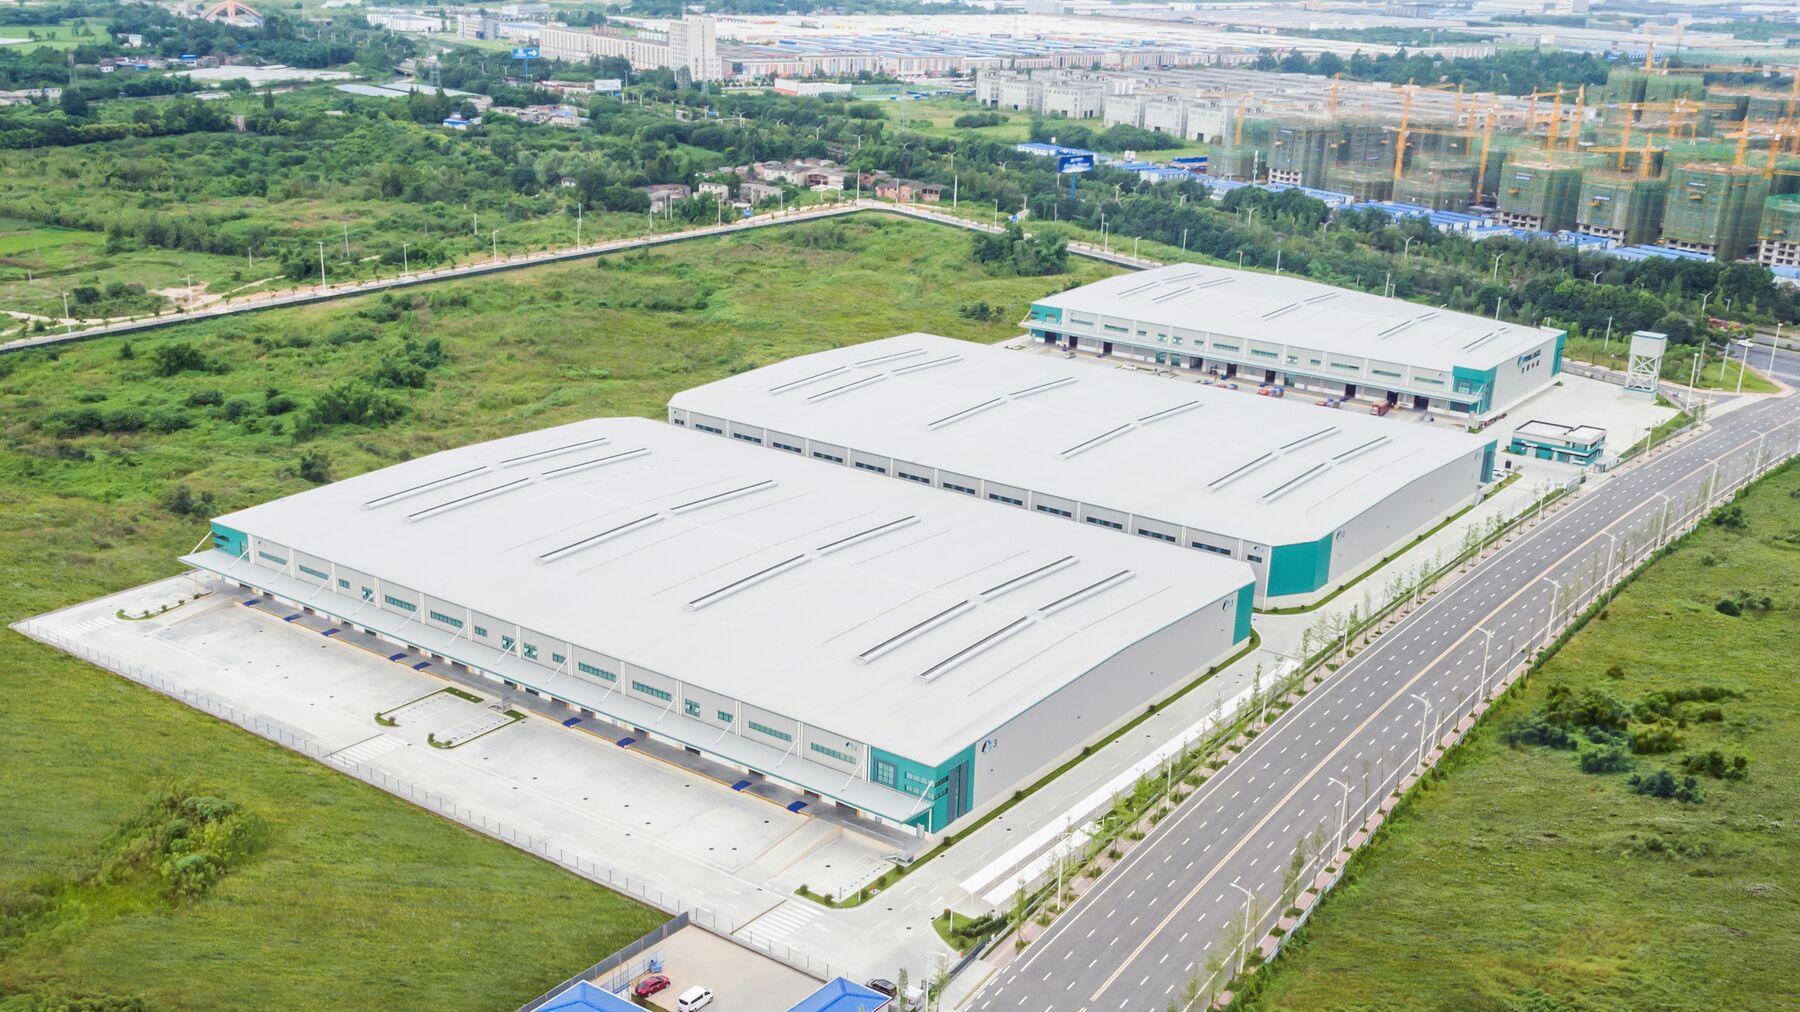 DPM-Prologis-Chengdu-Qingbaijiang-Logistics-Center-1.jpg